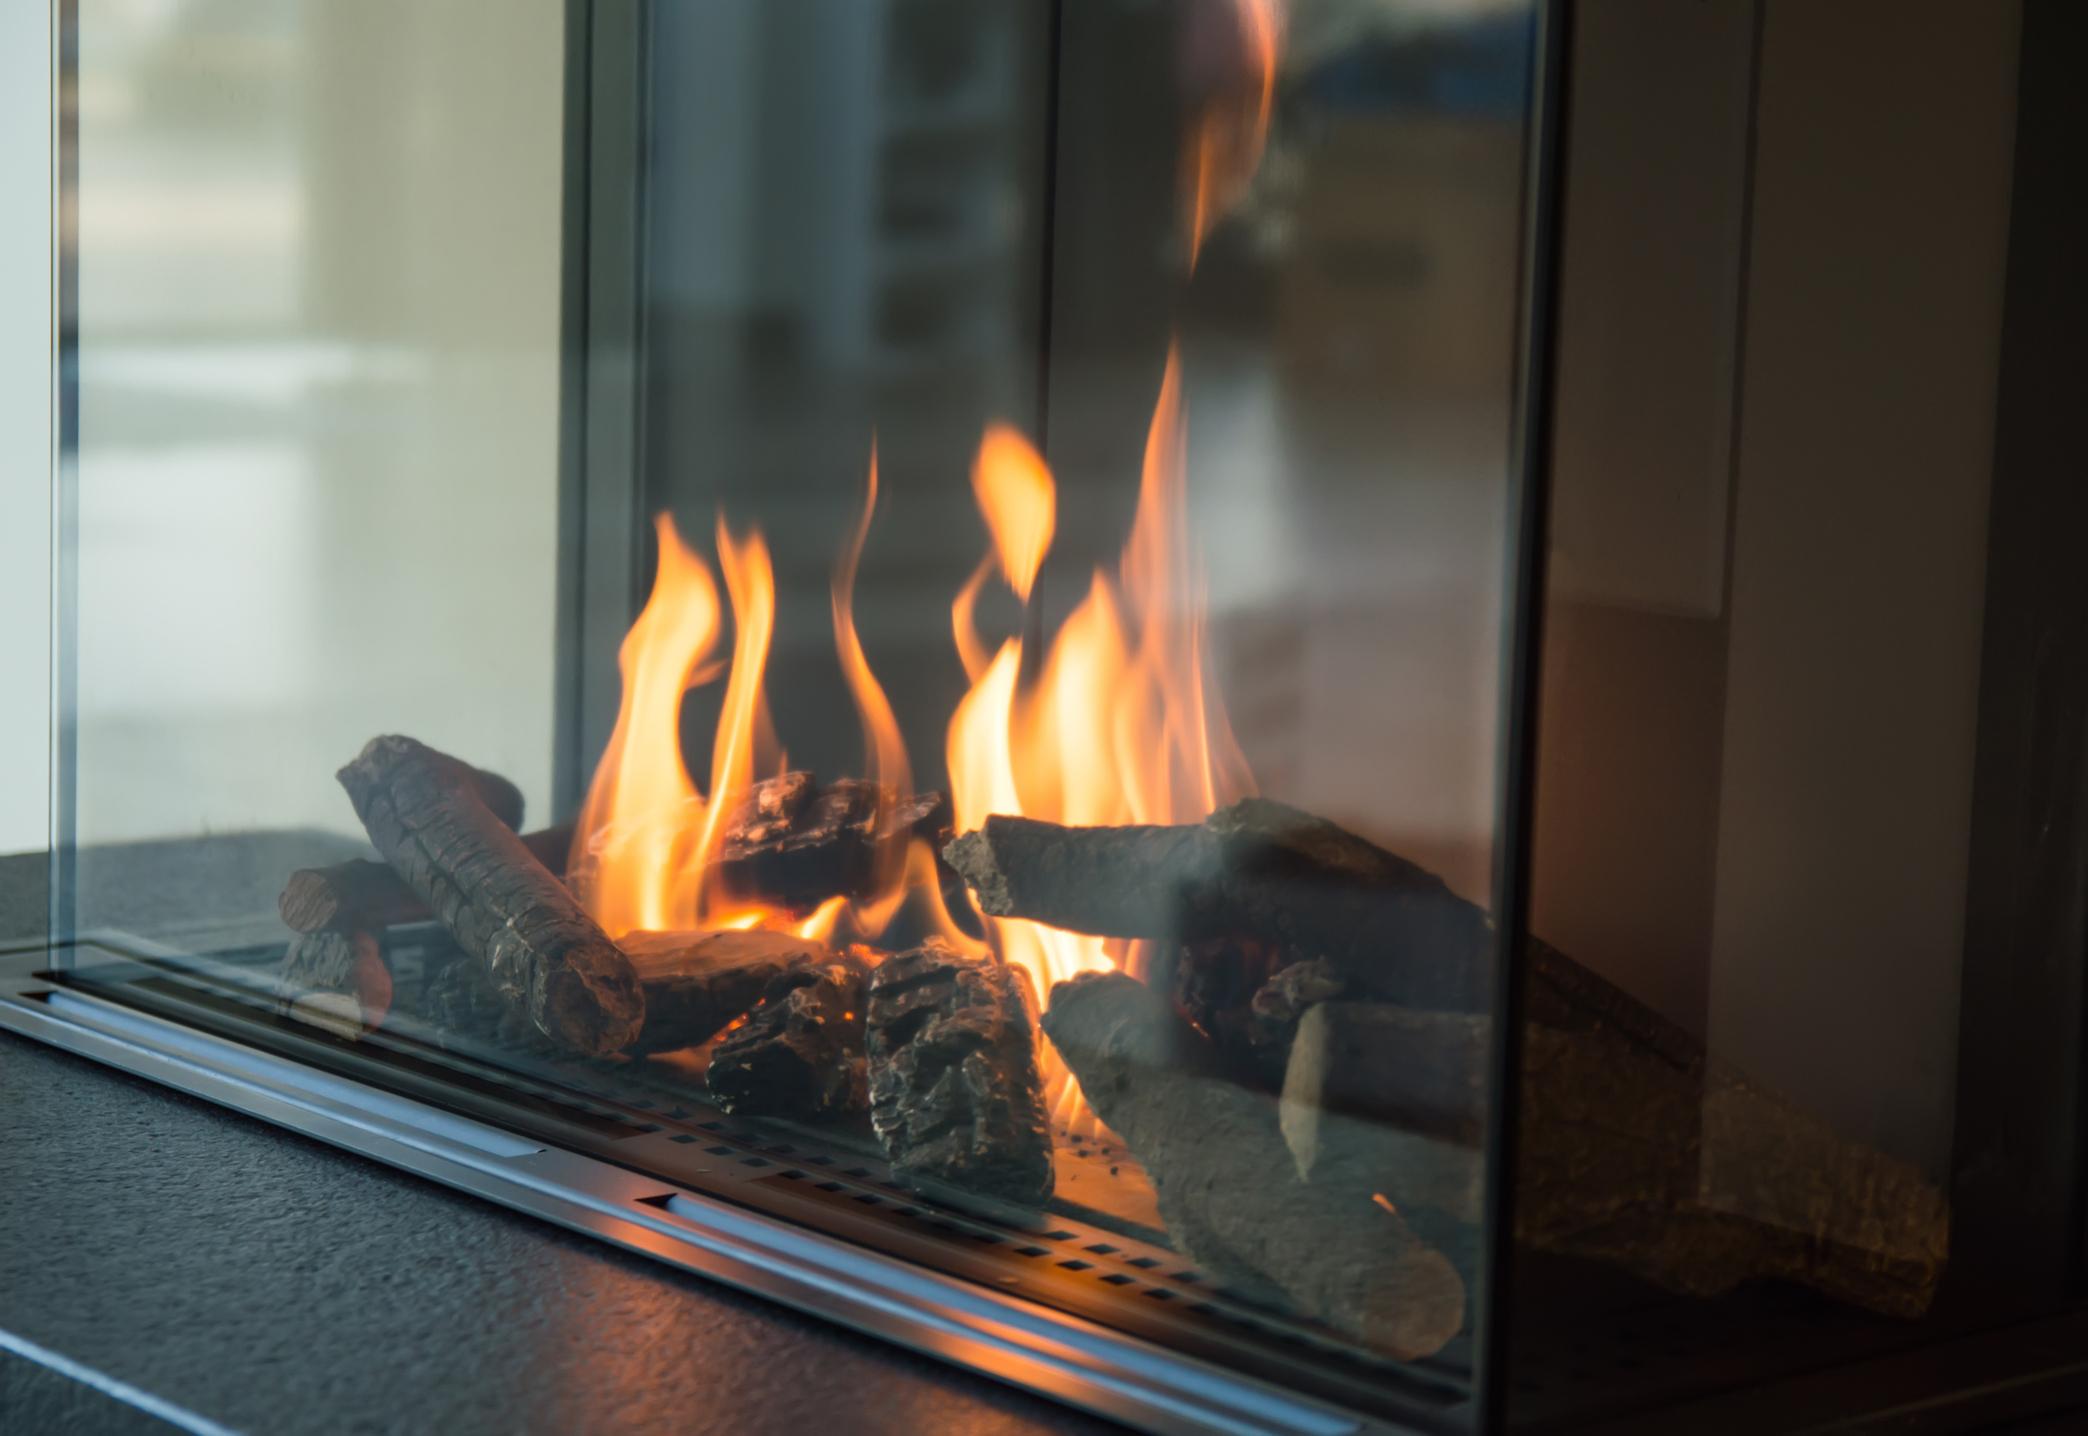 Gas Fireplace Burning